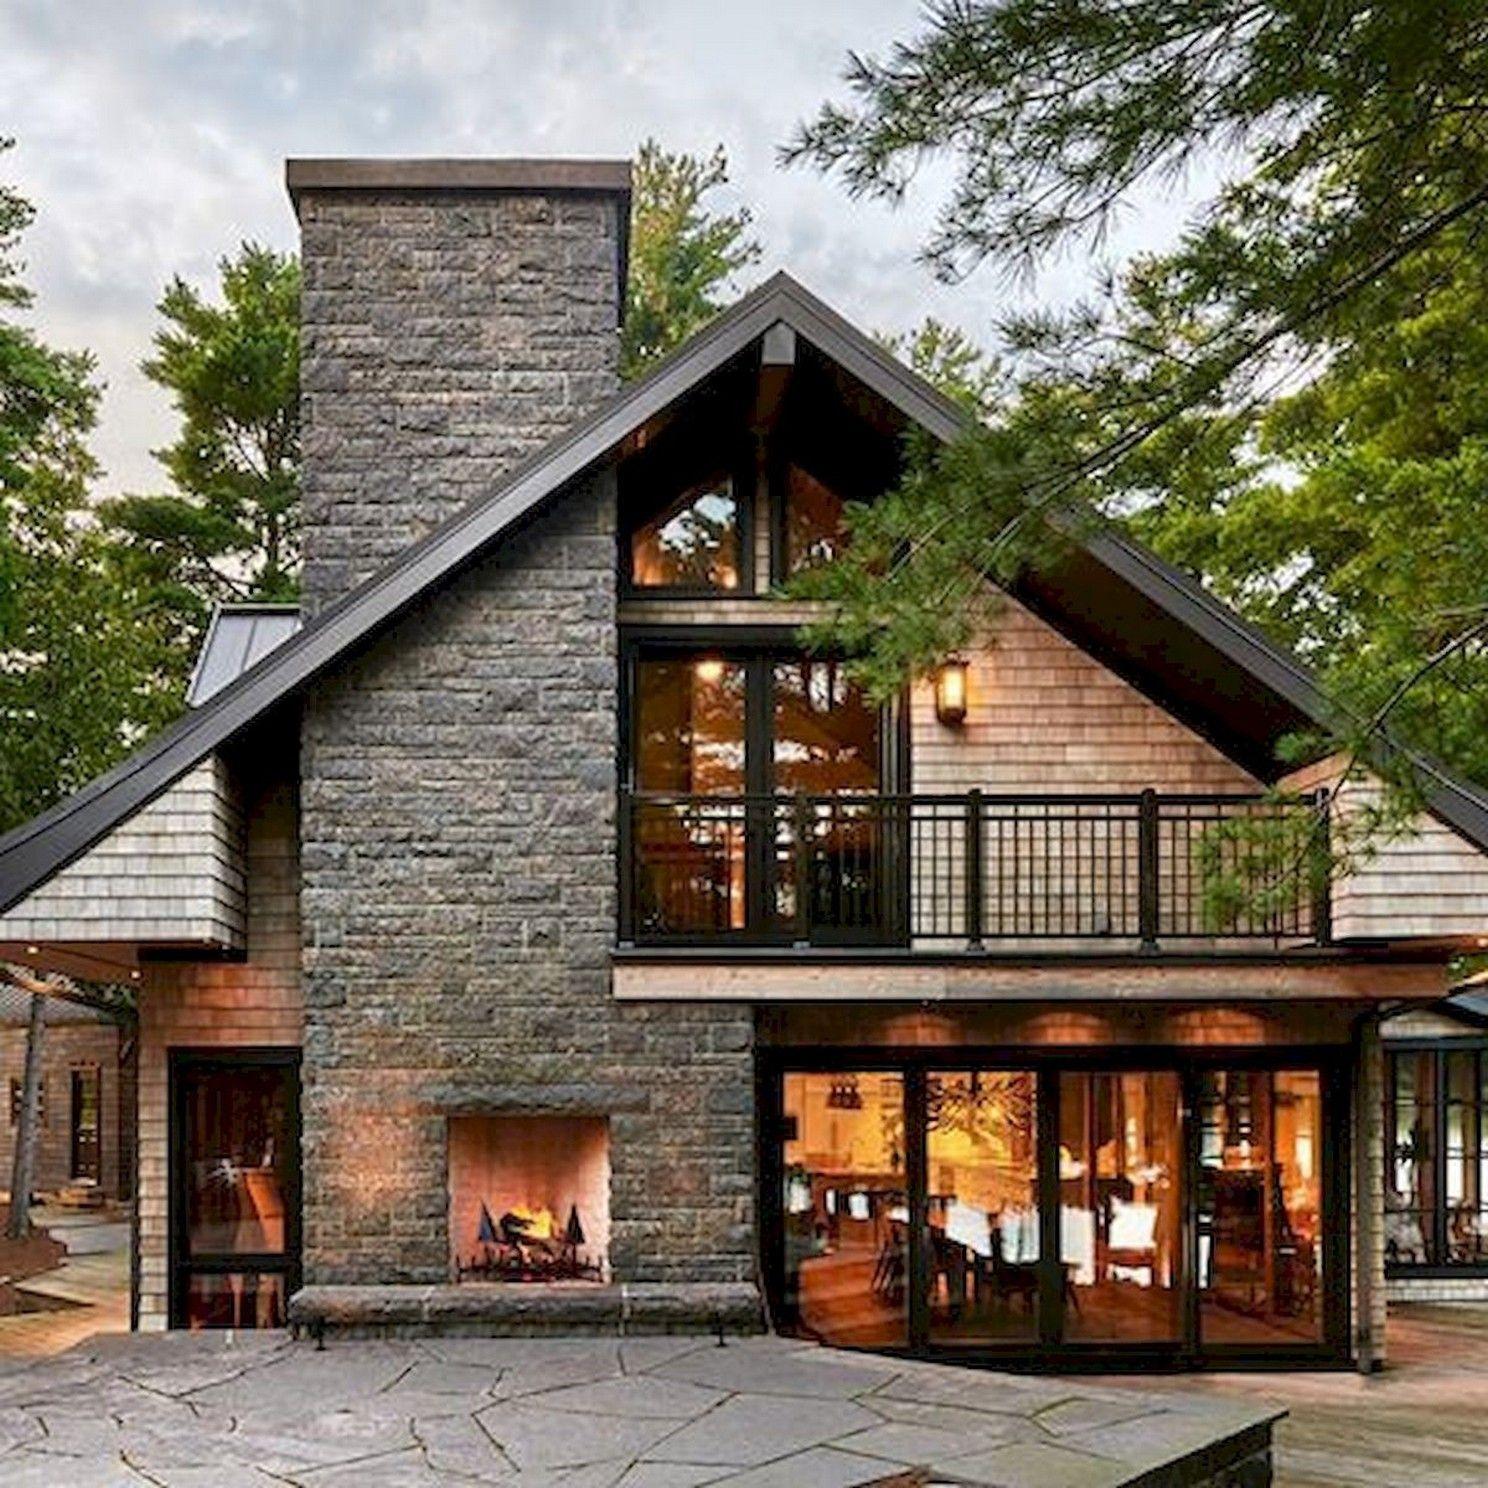 Modern Homes Exterior Designs Ideas: 15 Amazing Modern Home Design Ideas 10